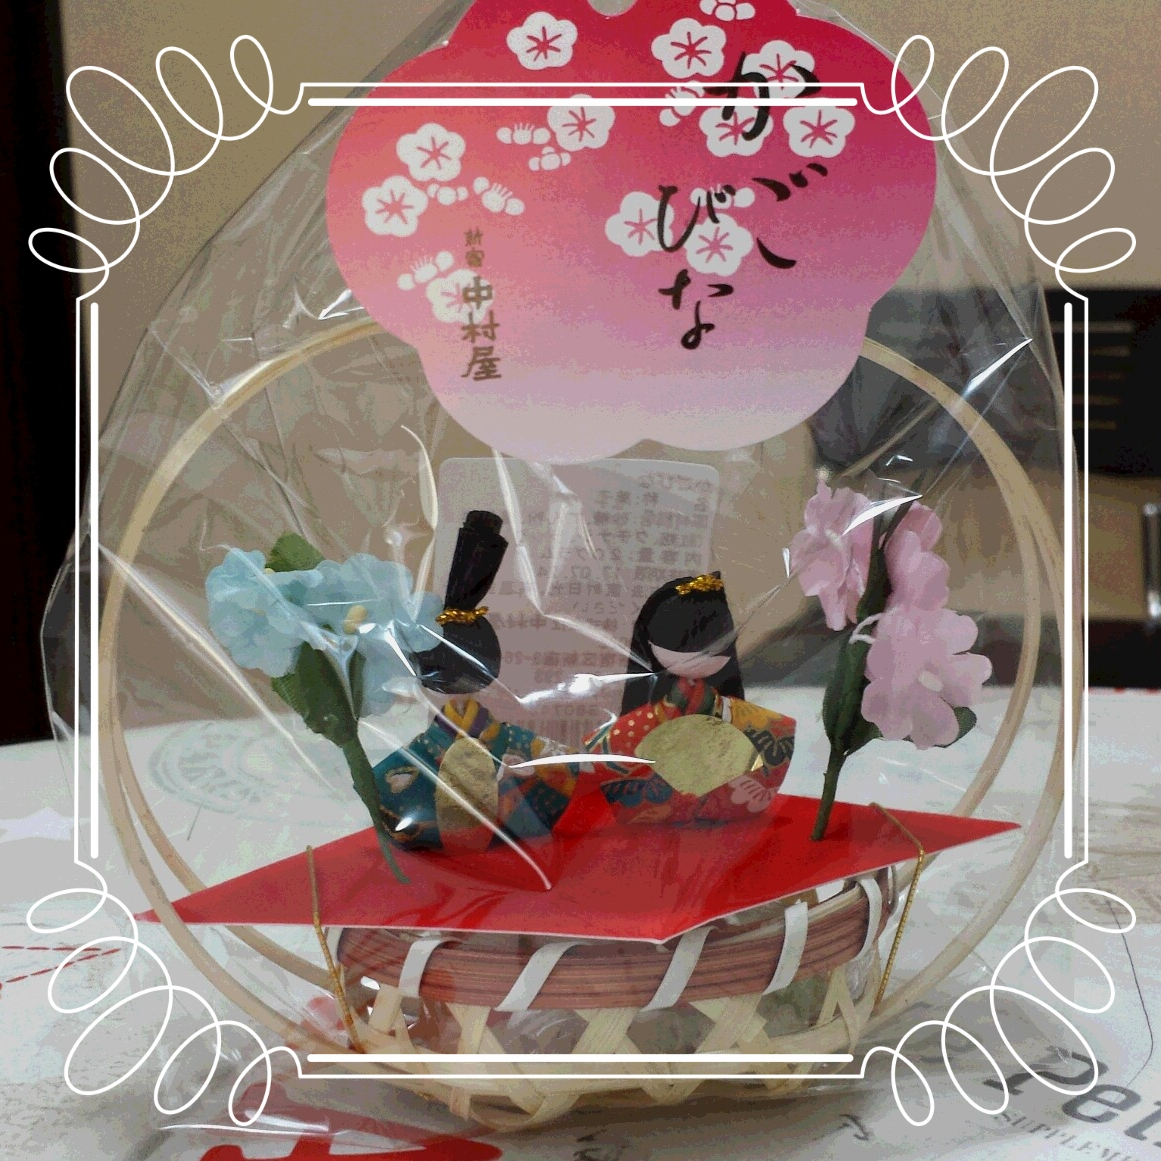 Bonbons et figurines de Hinamatsuri